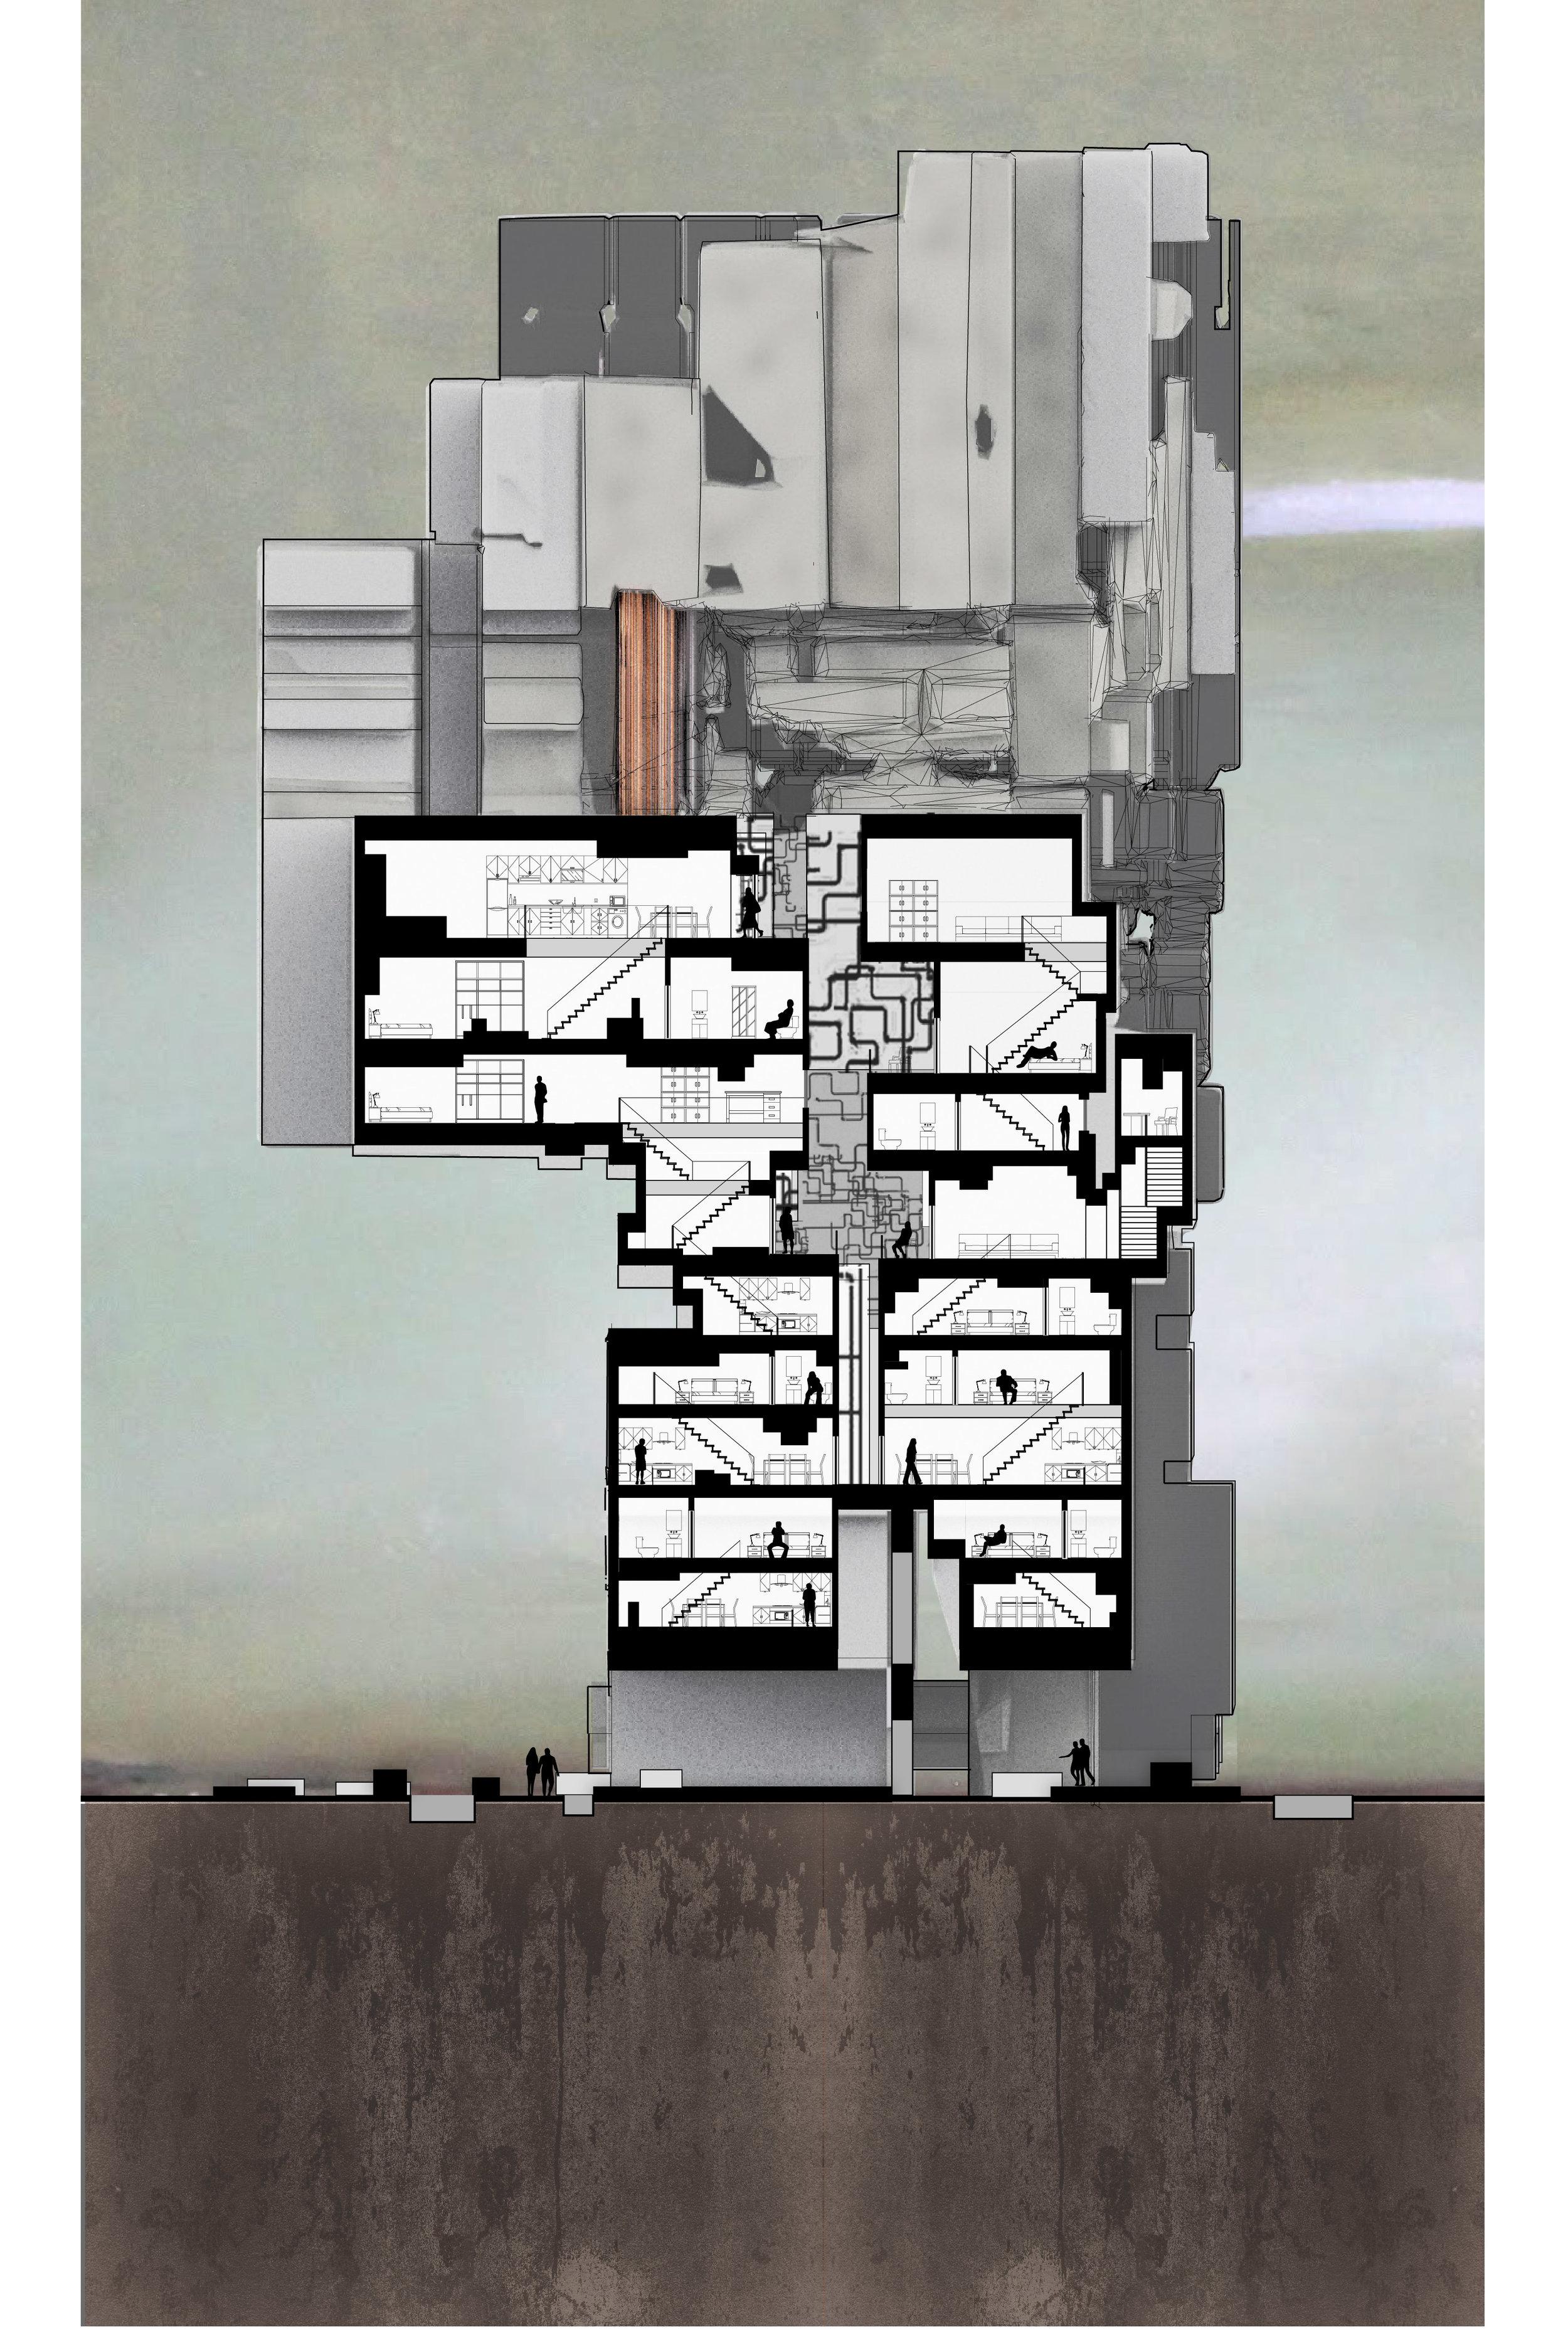 Residential Section Edits_img-01.jpg